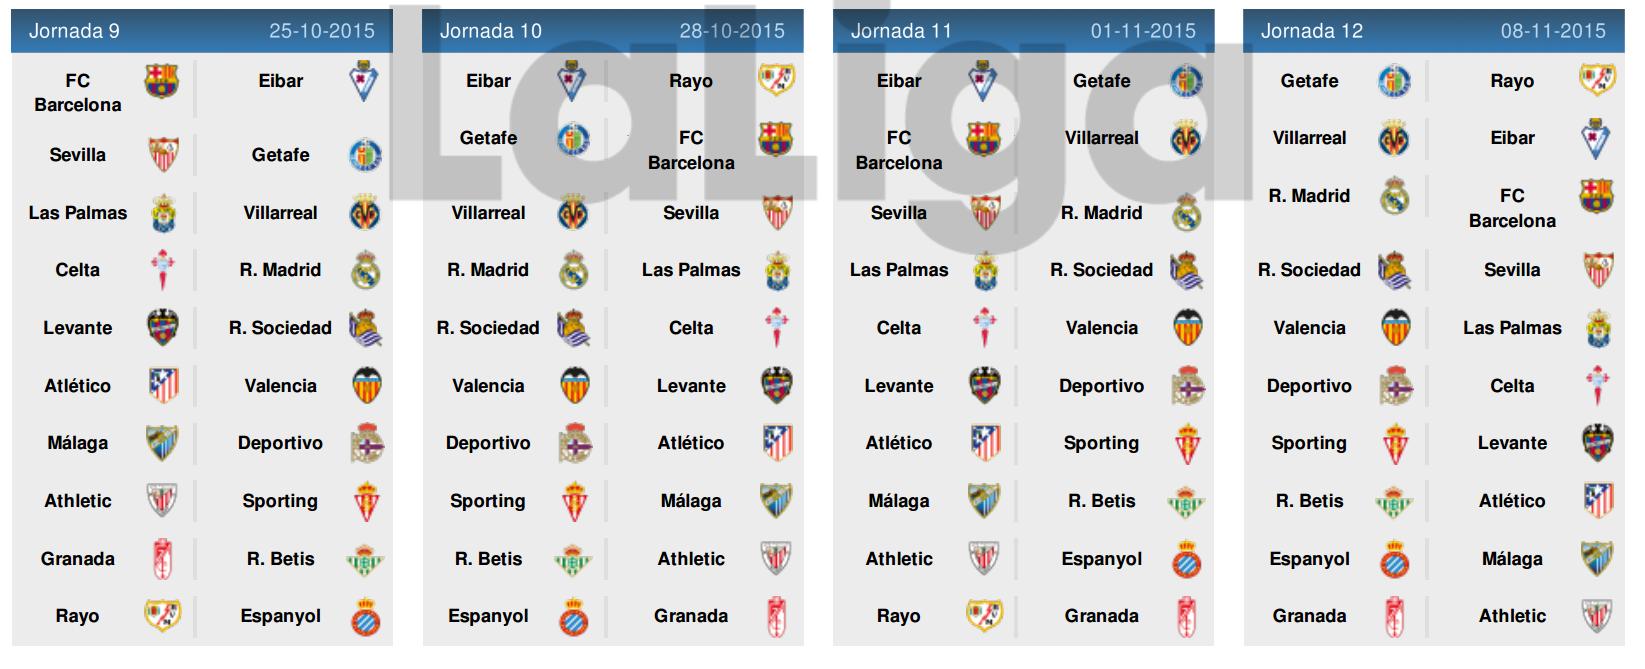 Jadwal Liga Spanyol 2015-2016 3